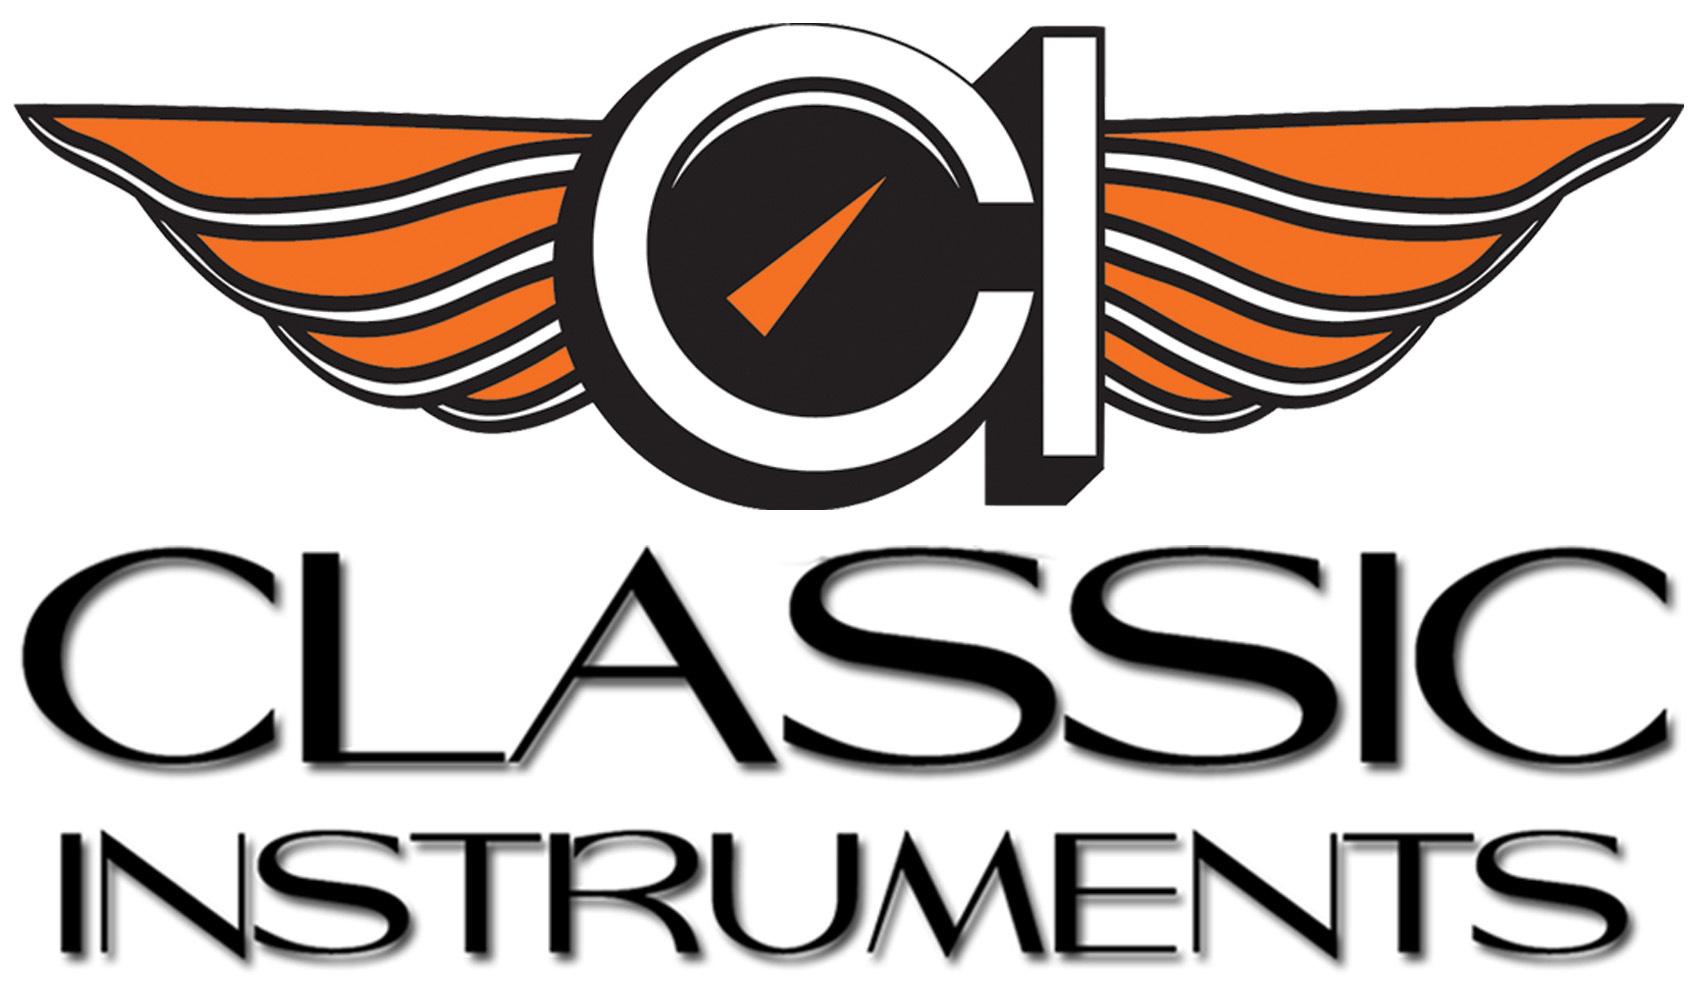 classic-instruments-logo-2016.jpg